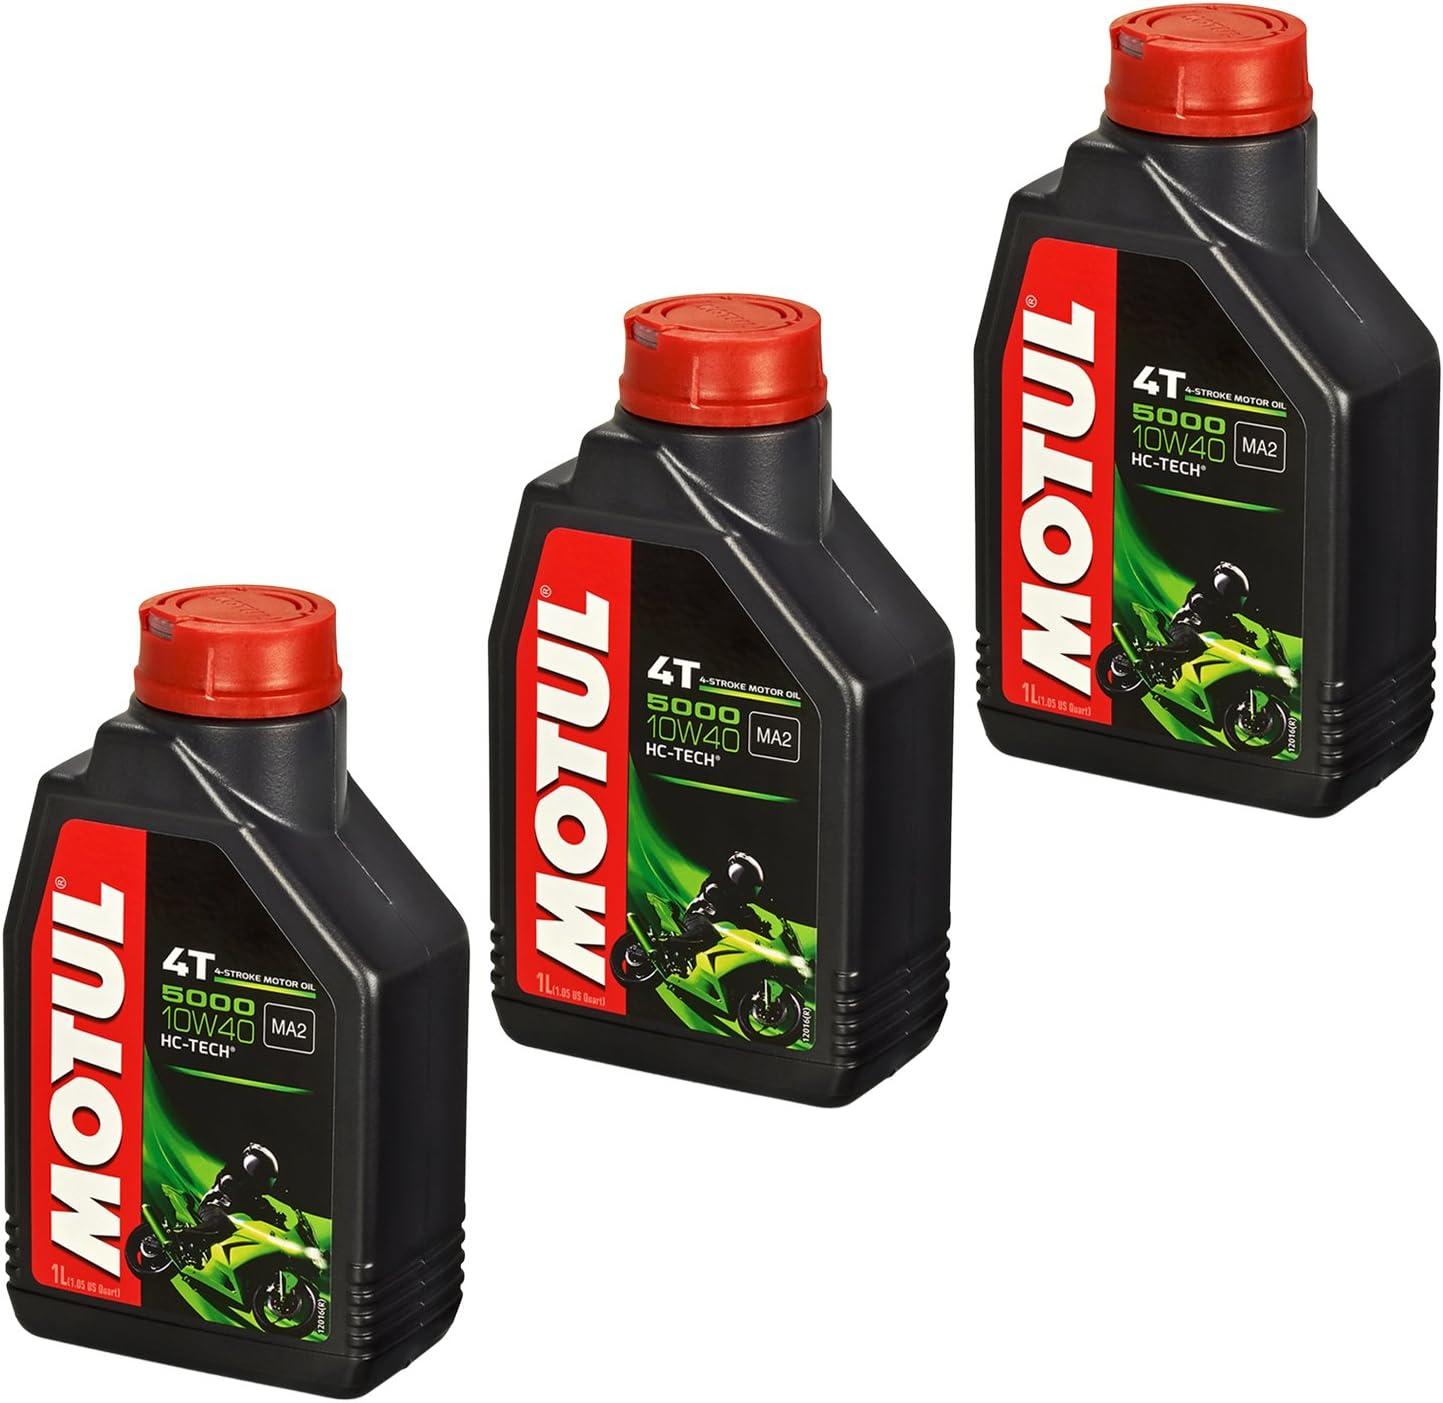 Motul 10w 40 Öl Hiflo Ölfilter Für Honda Cb 1000 R 08 15 Sc60 Ölwechselset Inkl Motoröl Filter Dichtring Auto